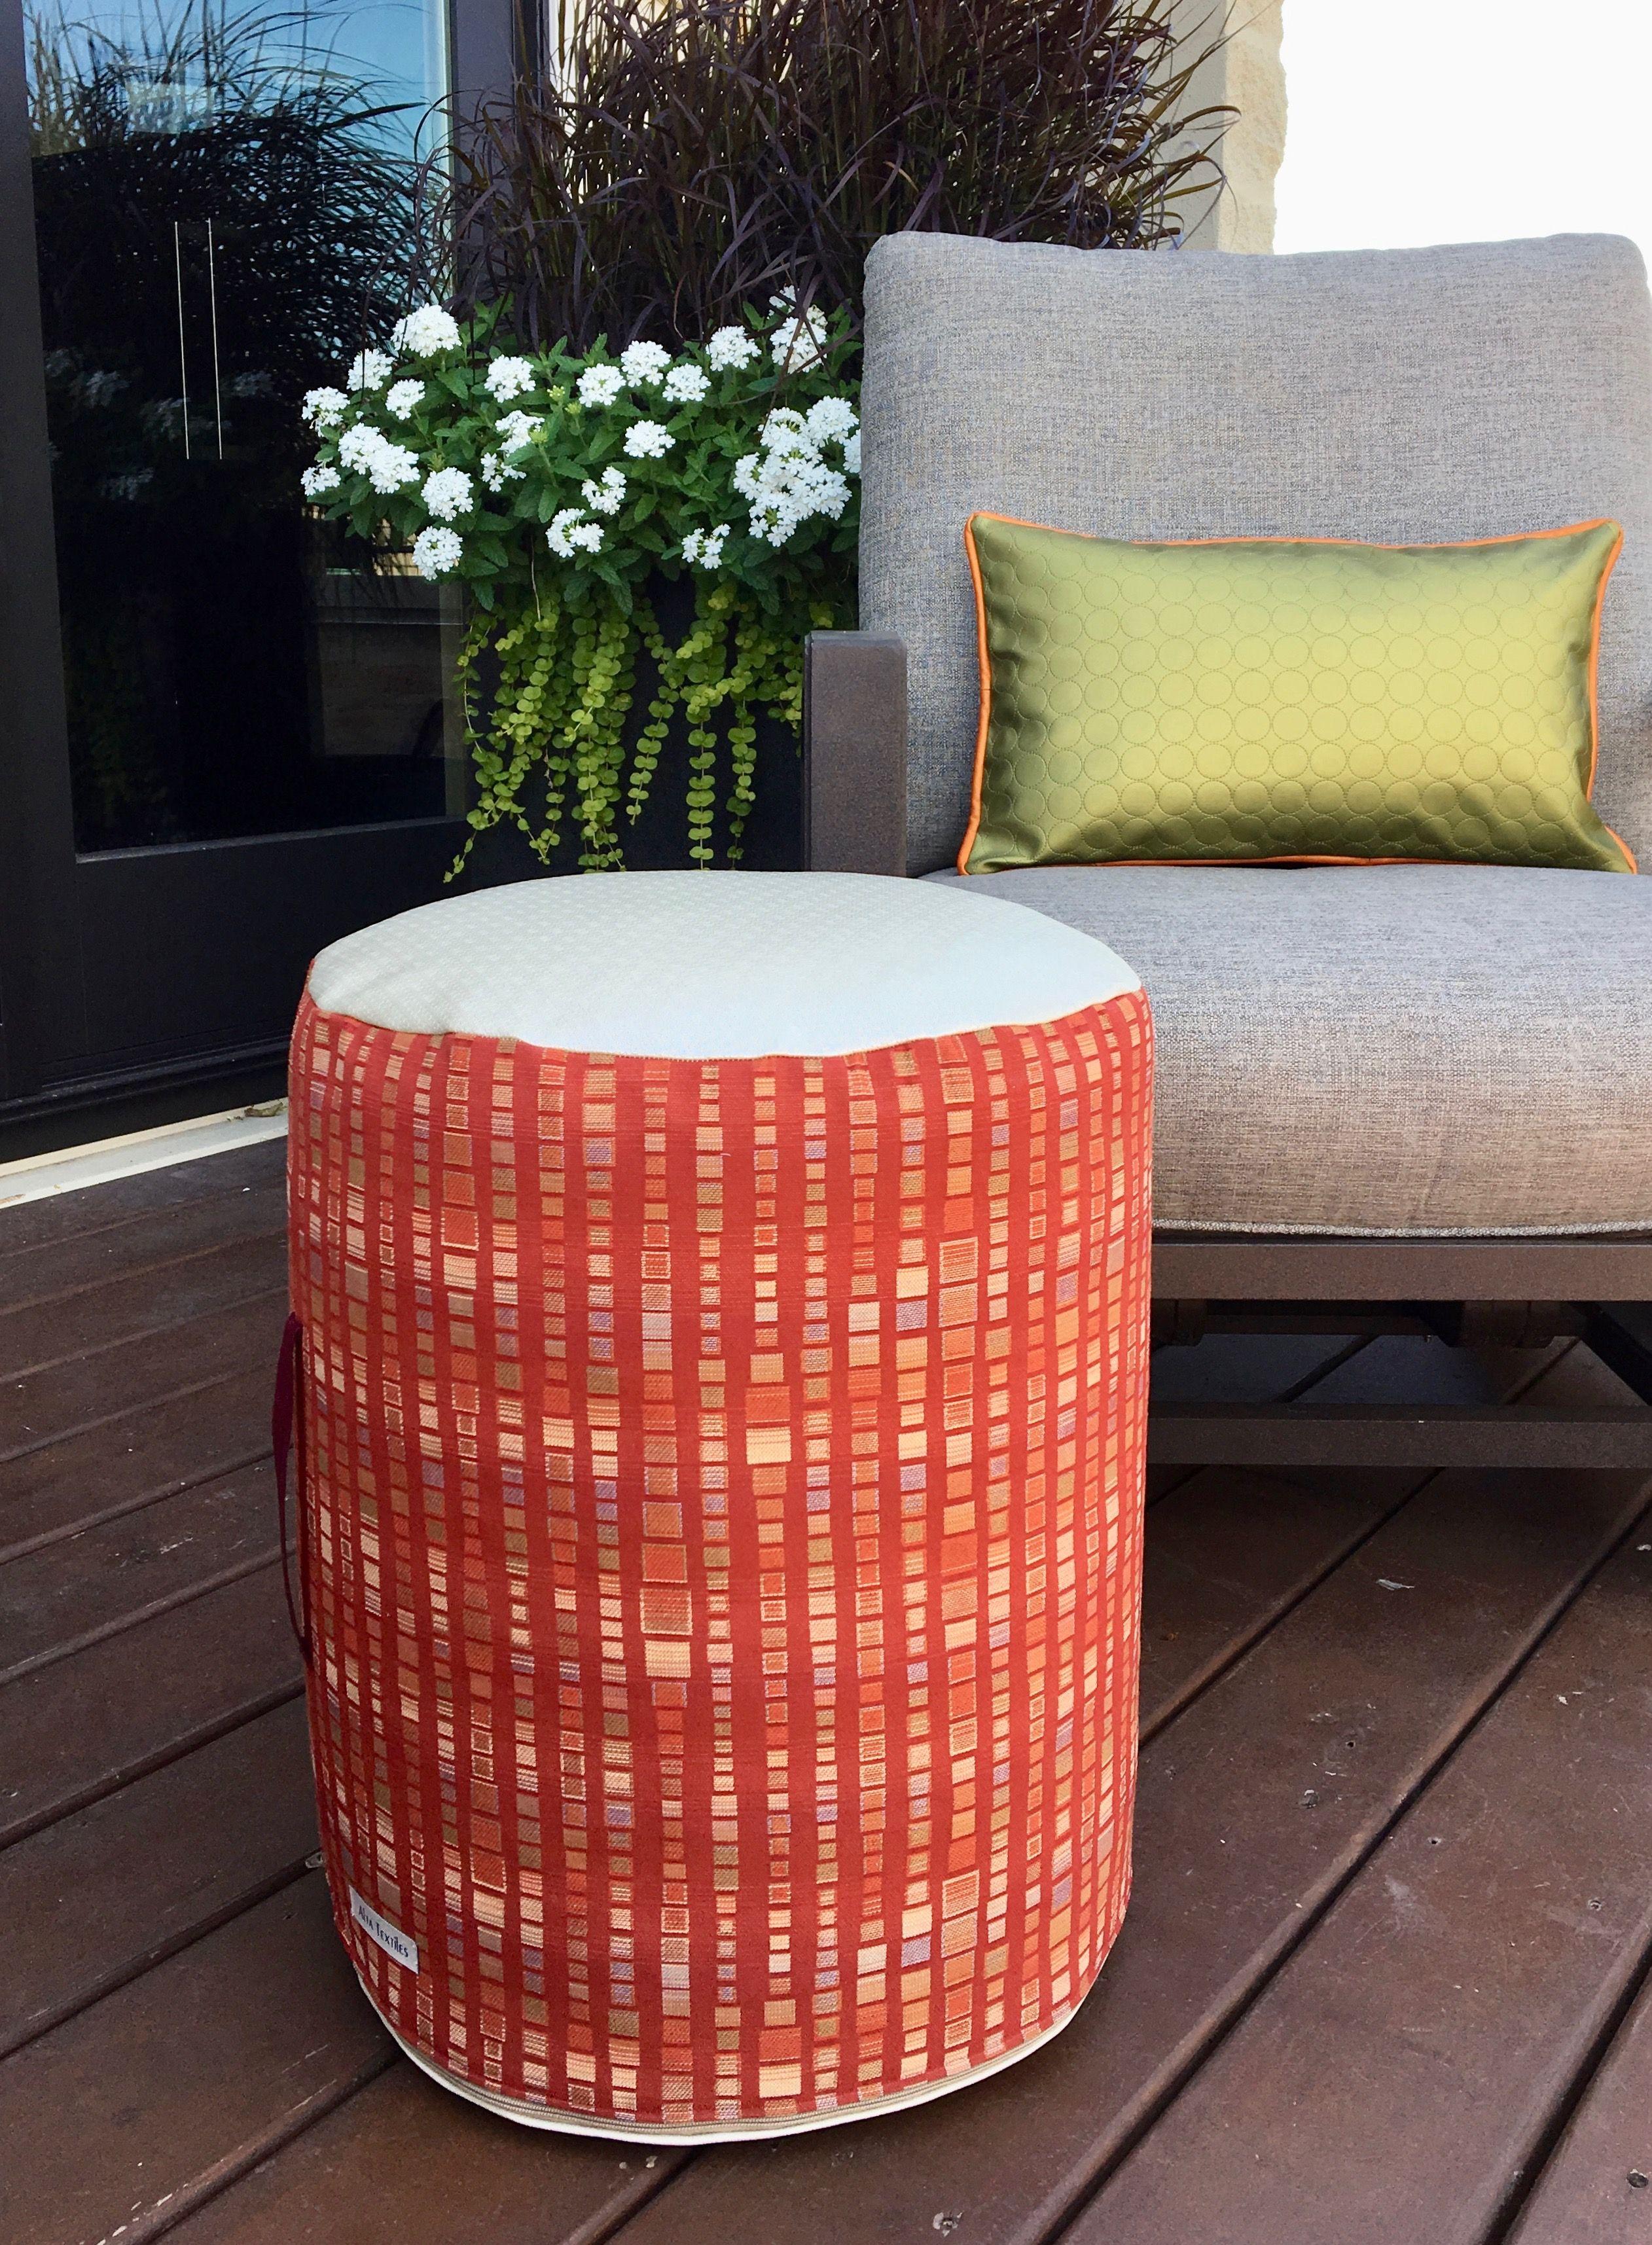 Strange An Outdoor Pouf Ottoman The Side Is A Bright Orange Outdoor Uwap Interior Chair Design Uwaporg